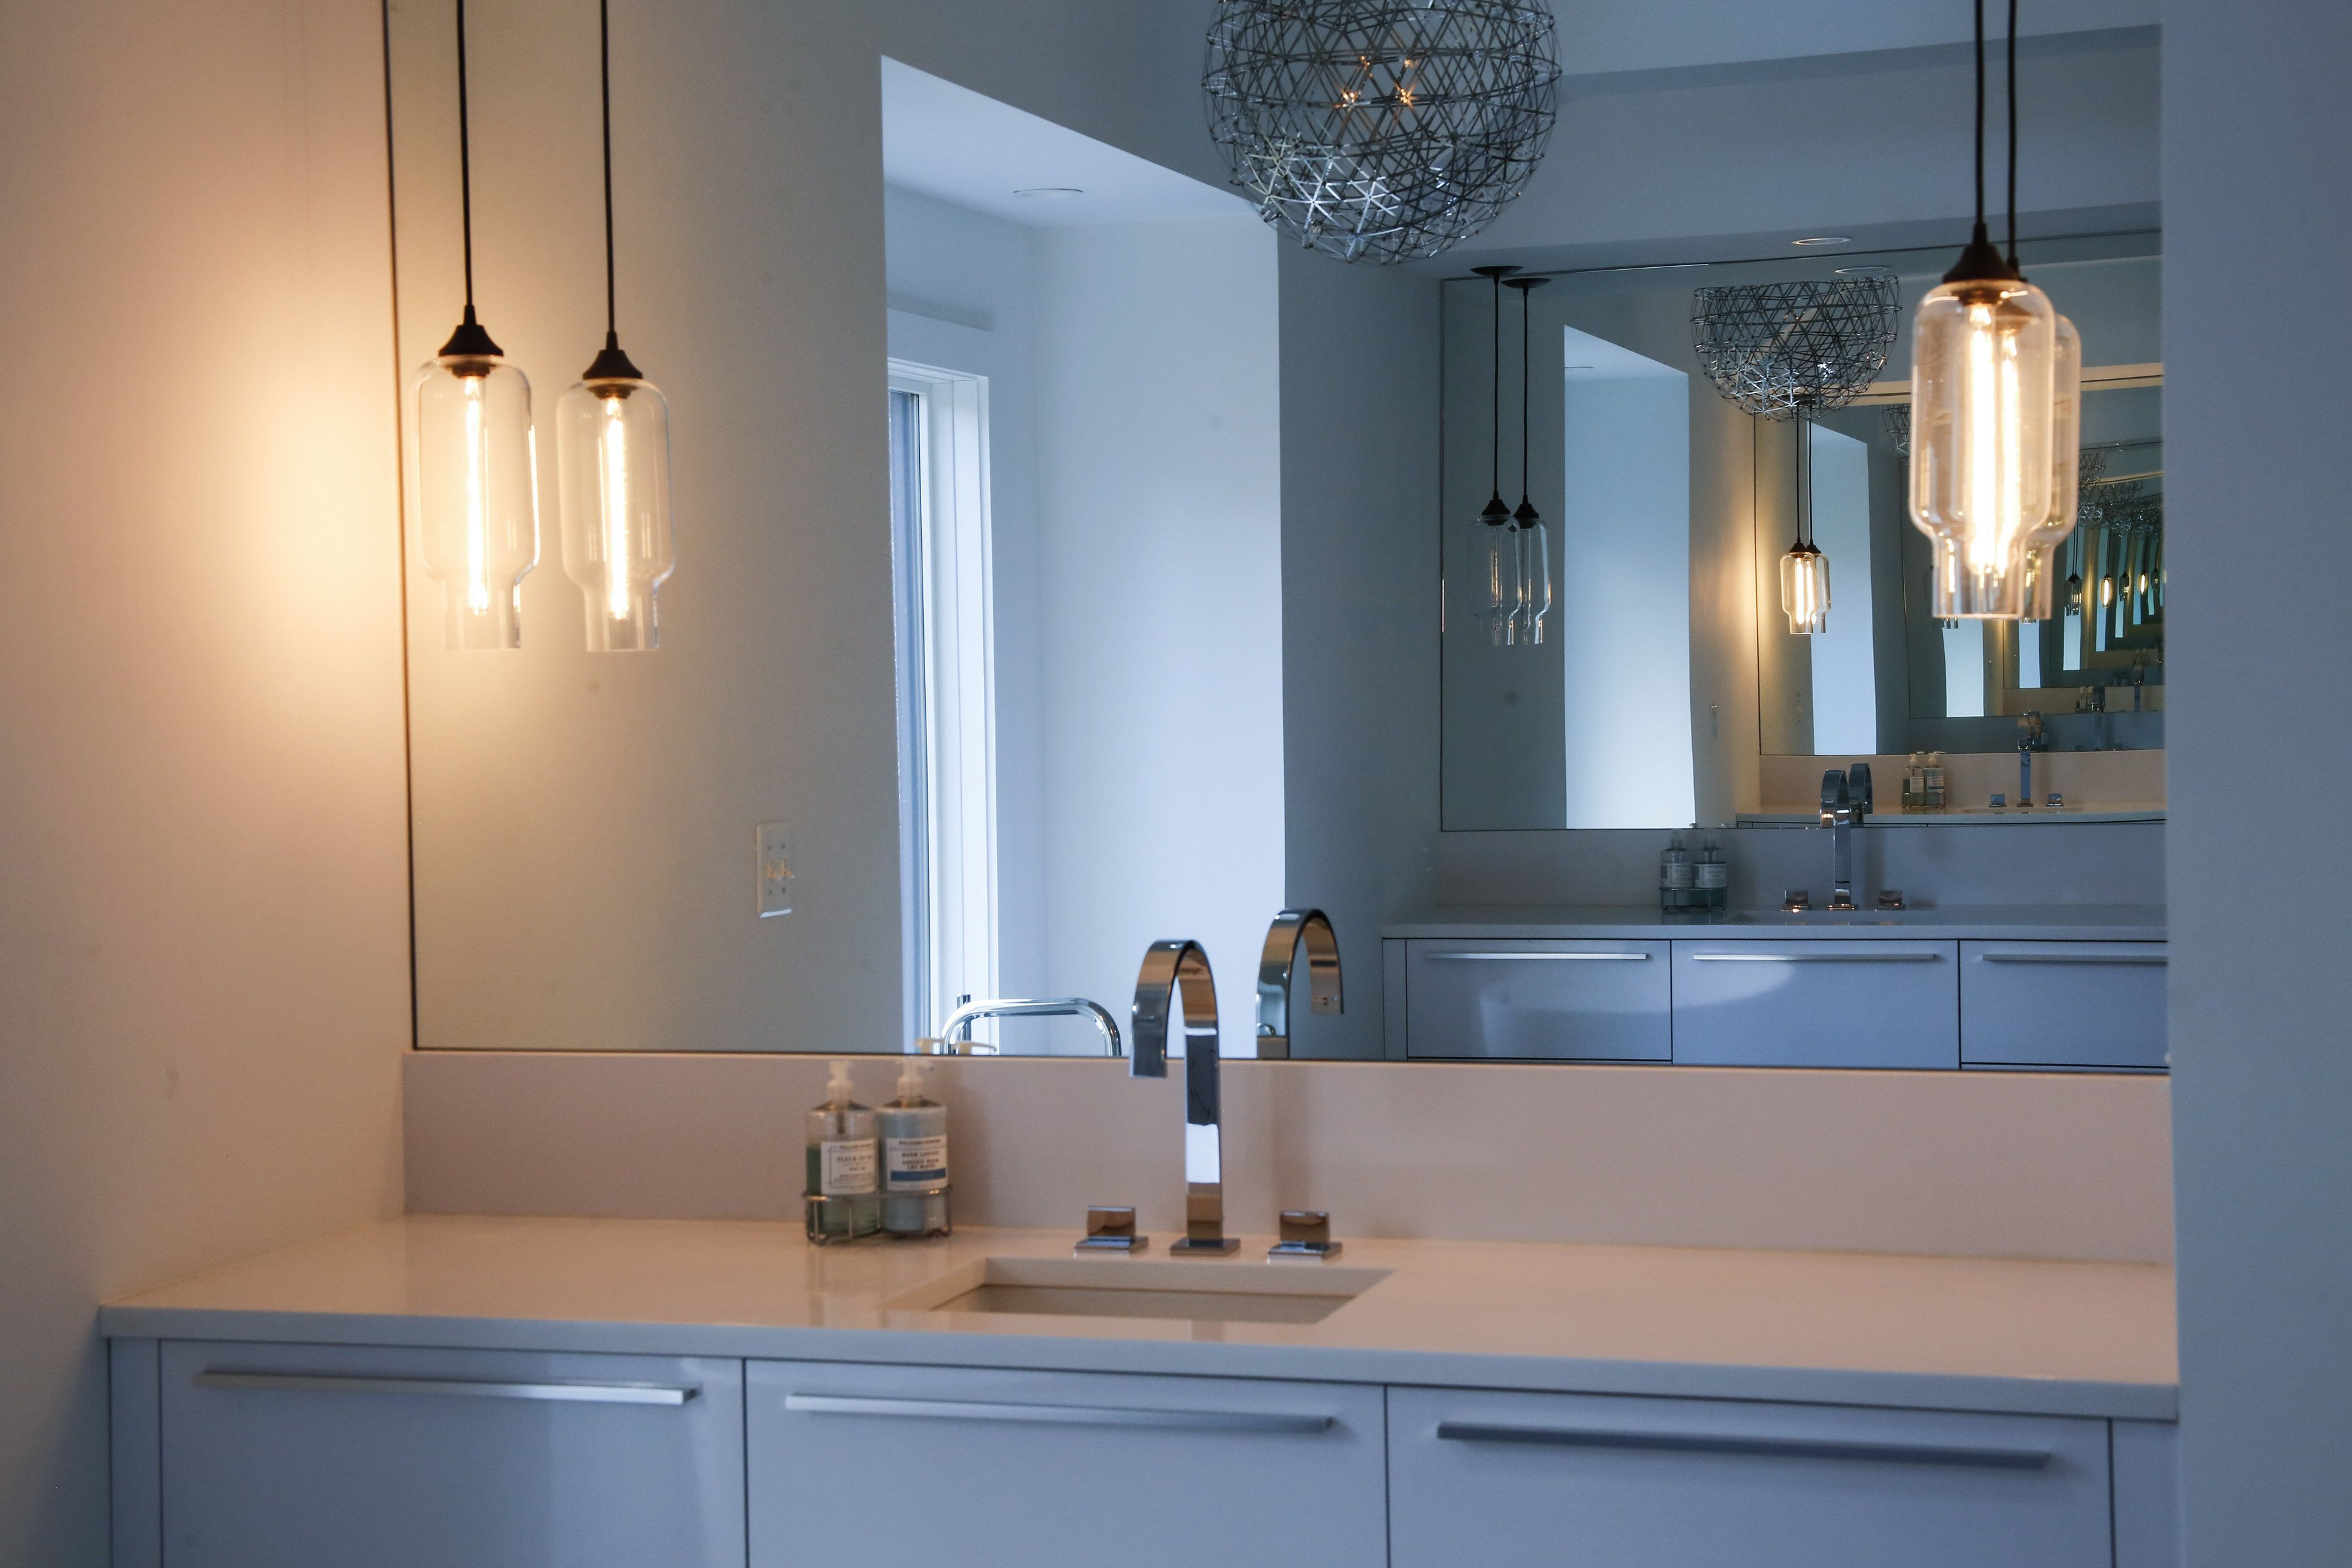 Private Home, Arlington Virginia, Lighting Design by Nicole Brose ...